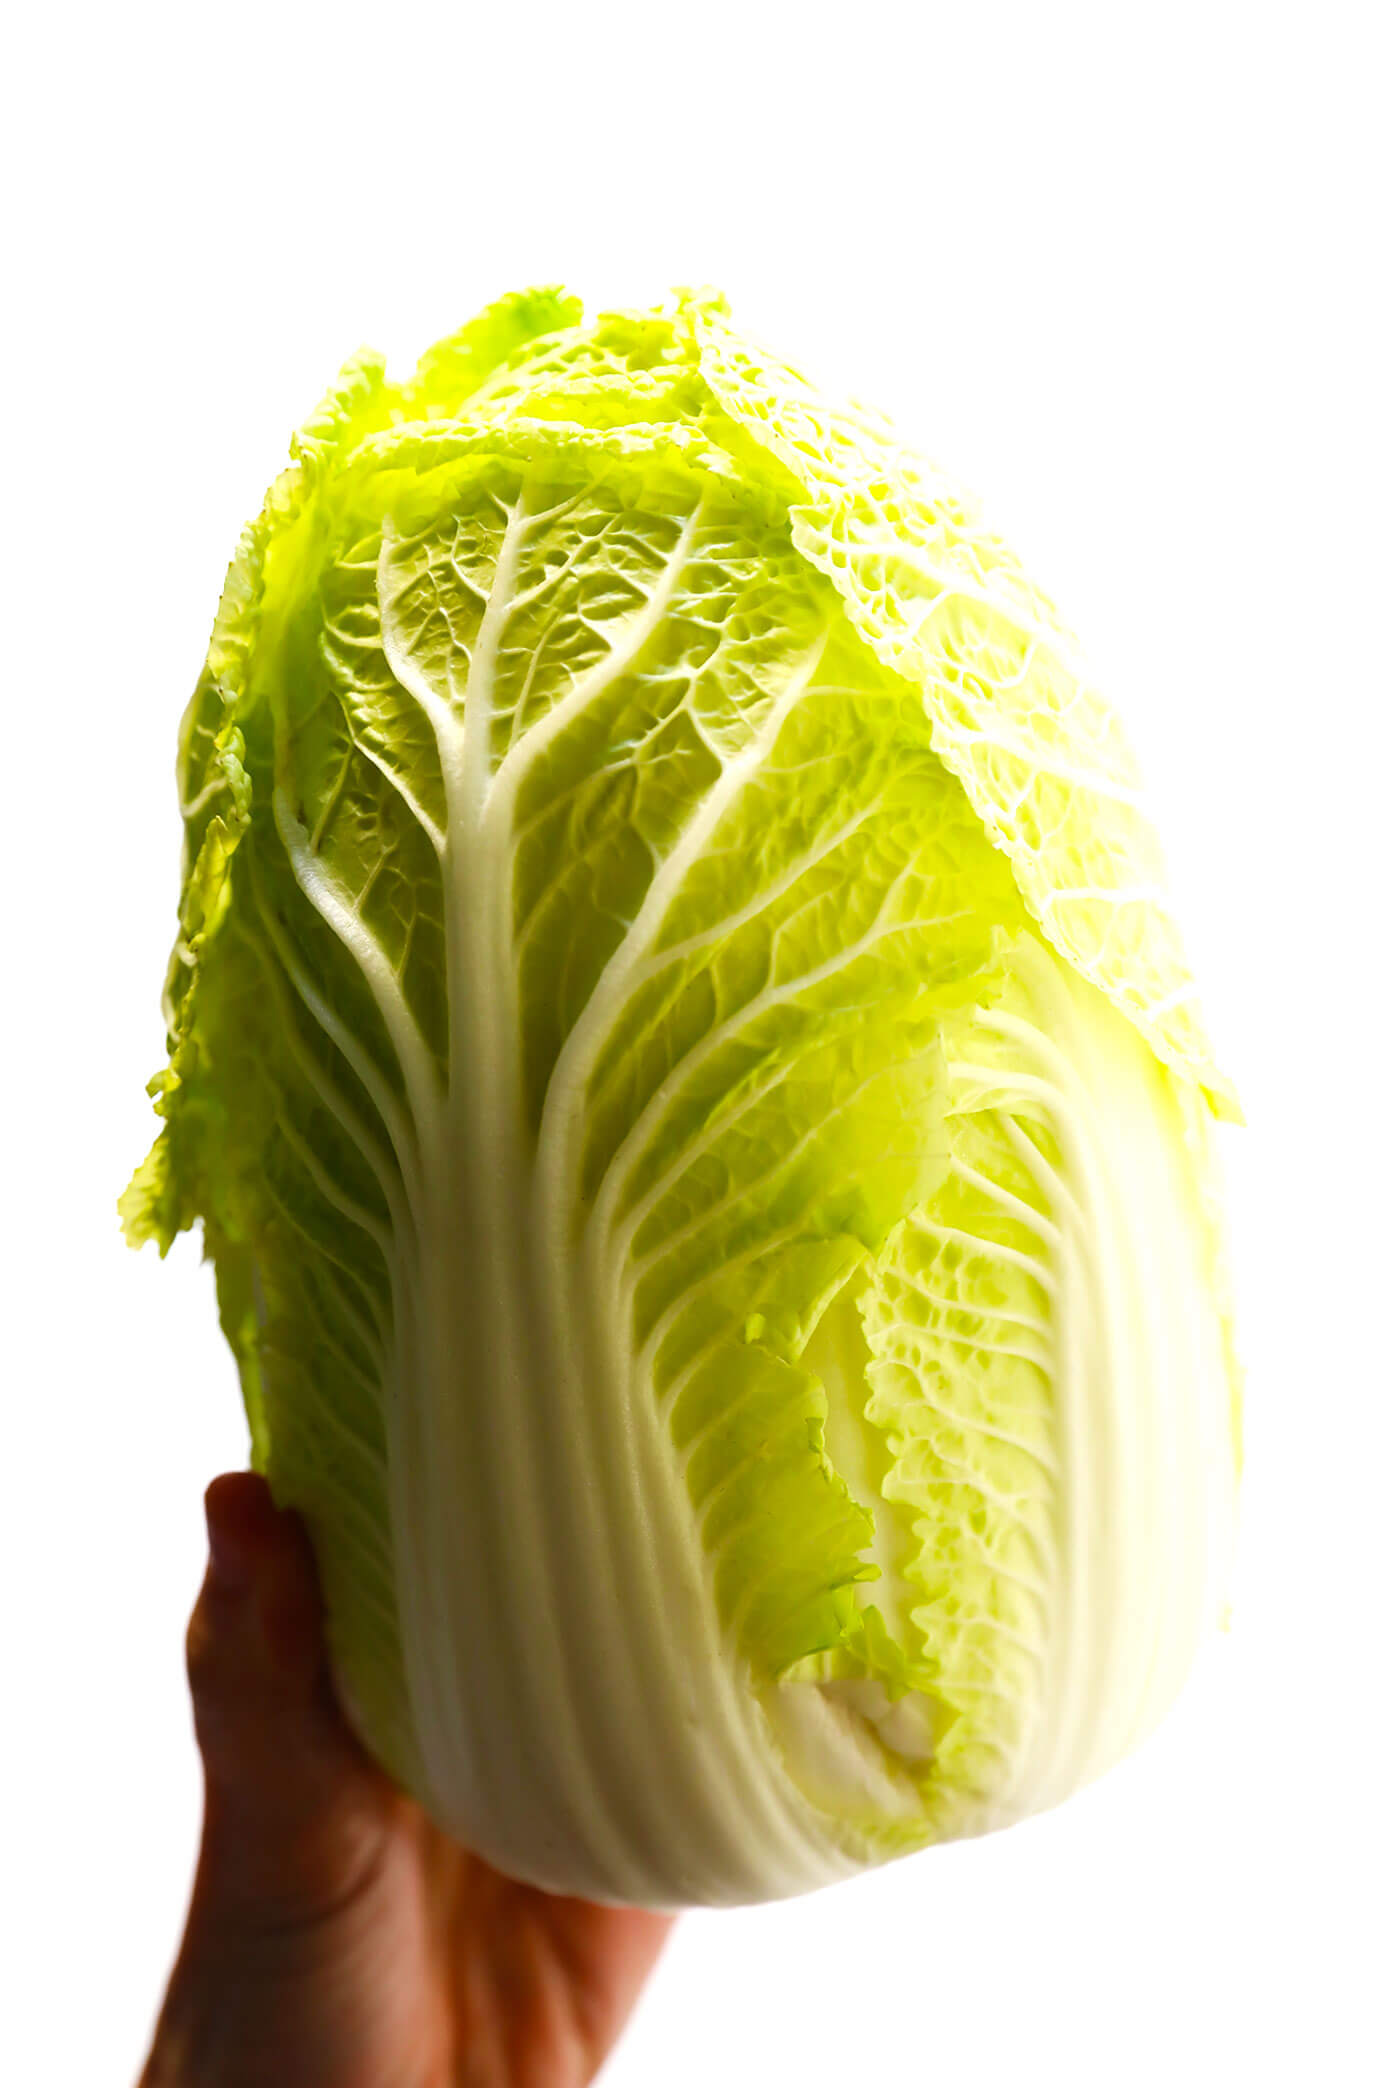 Chinese Napa Cabbage